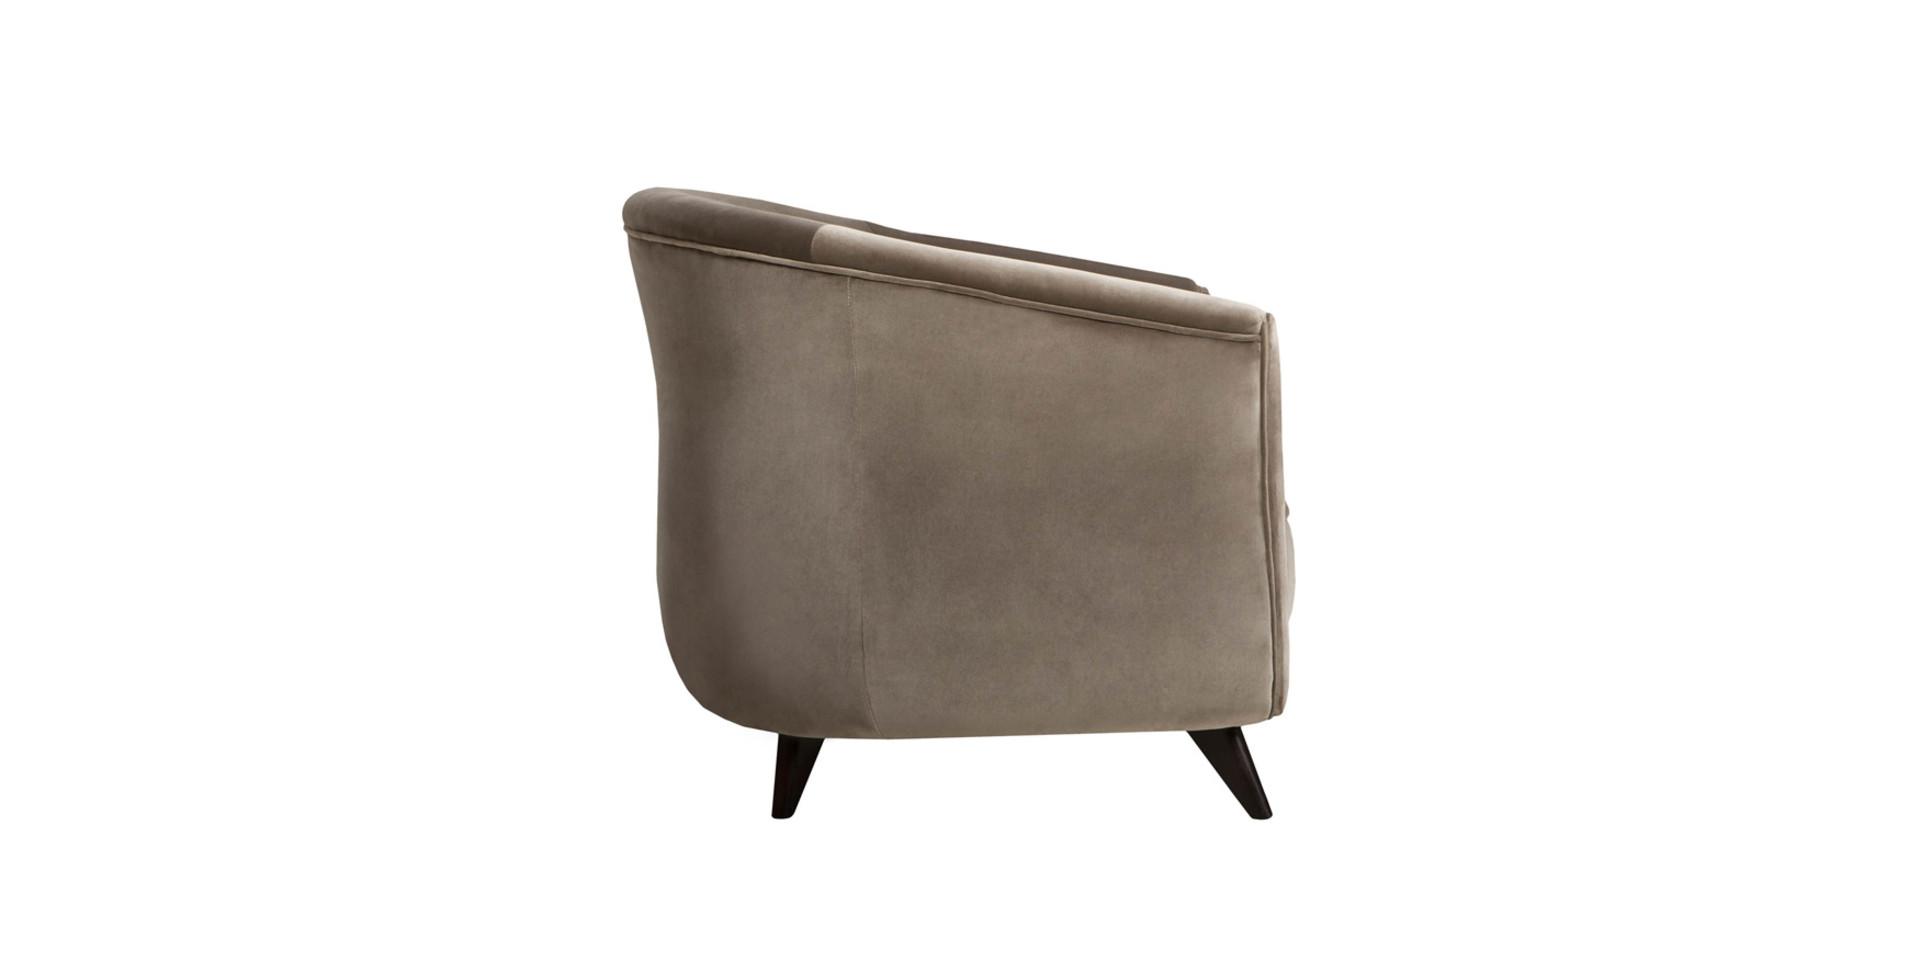 KAJSA_armchair_classic_velvet2_potato_3